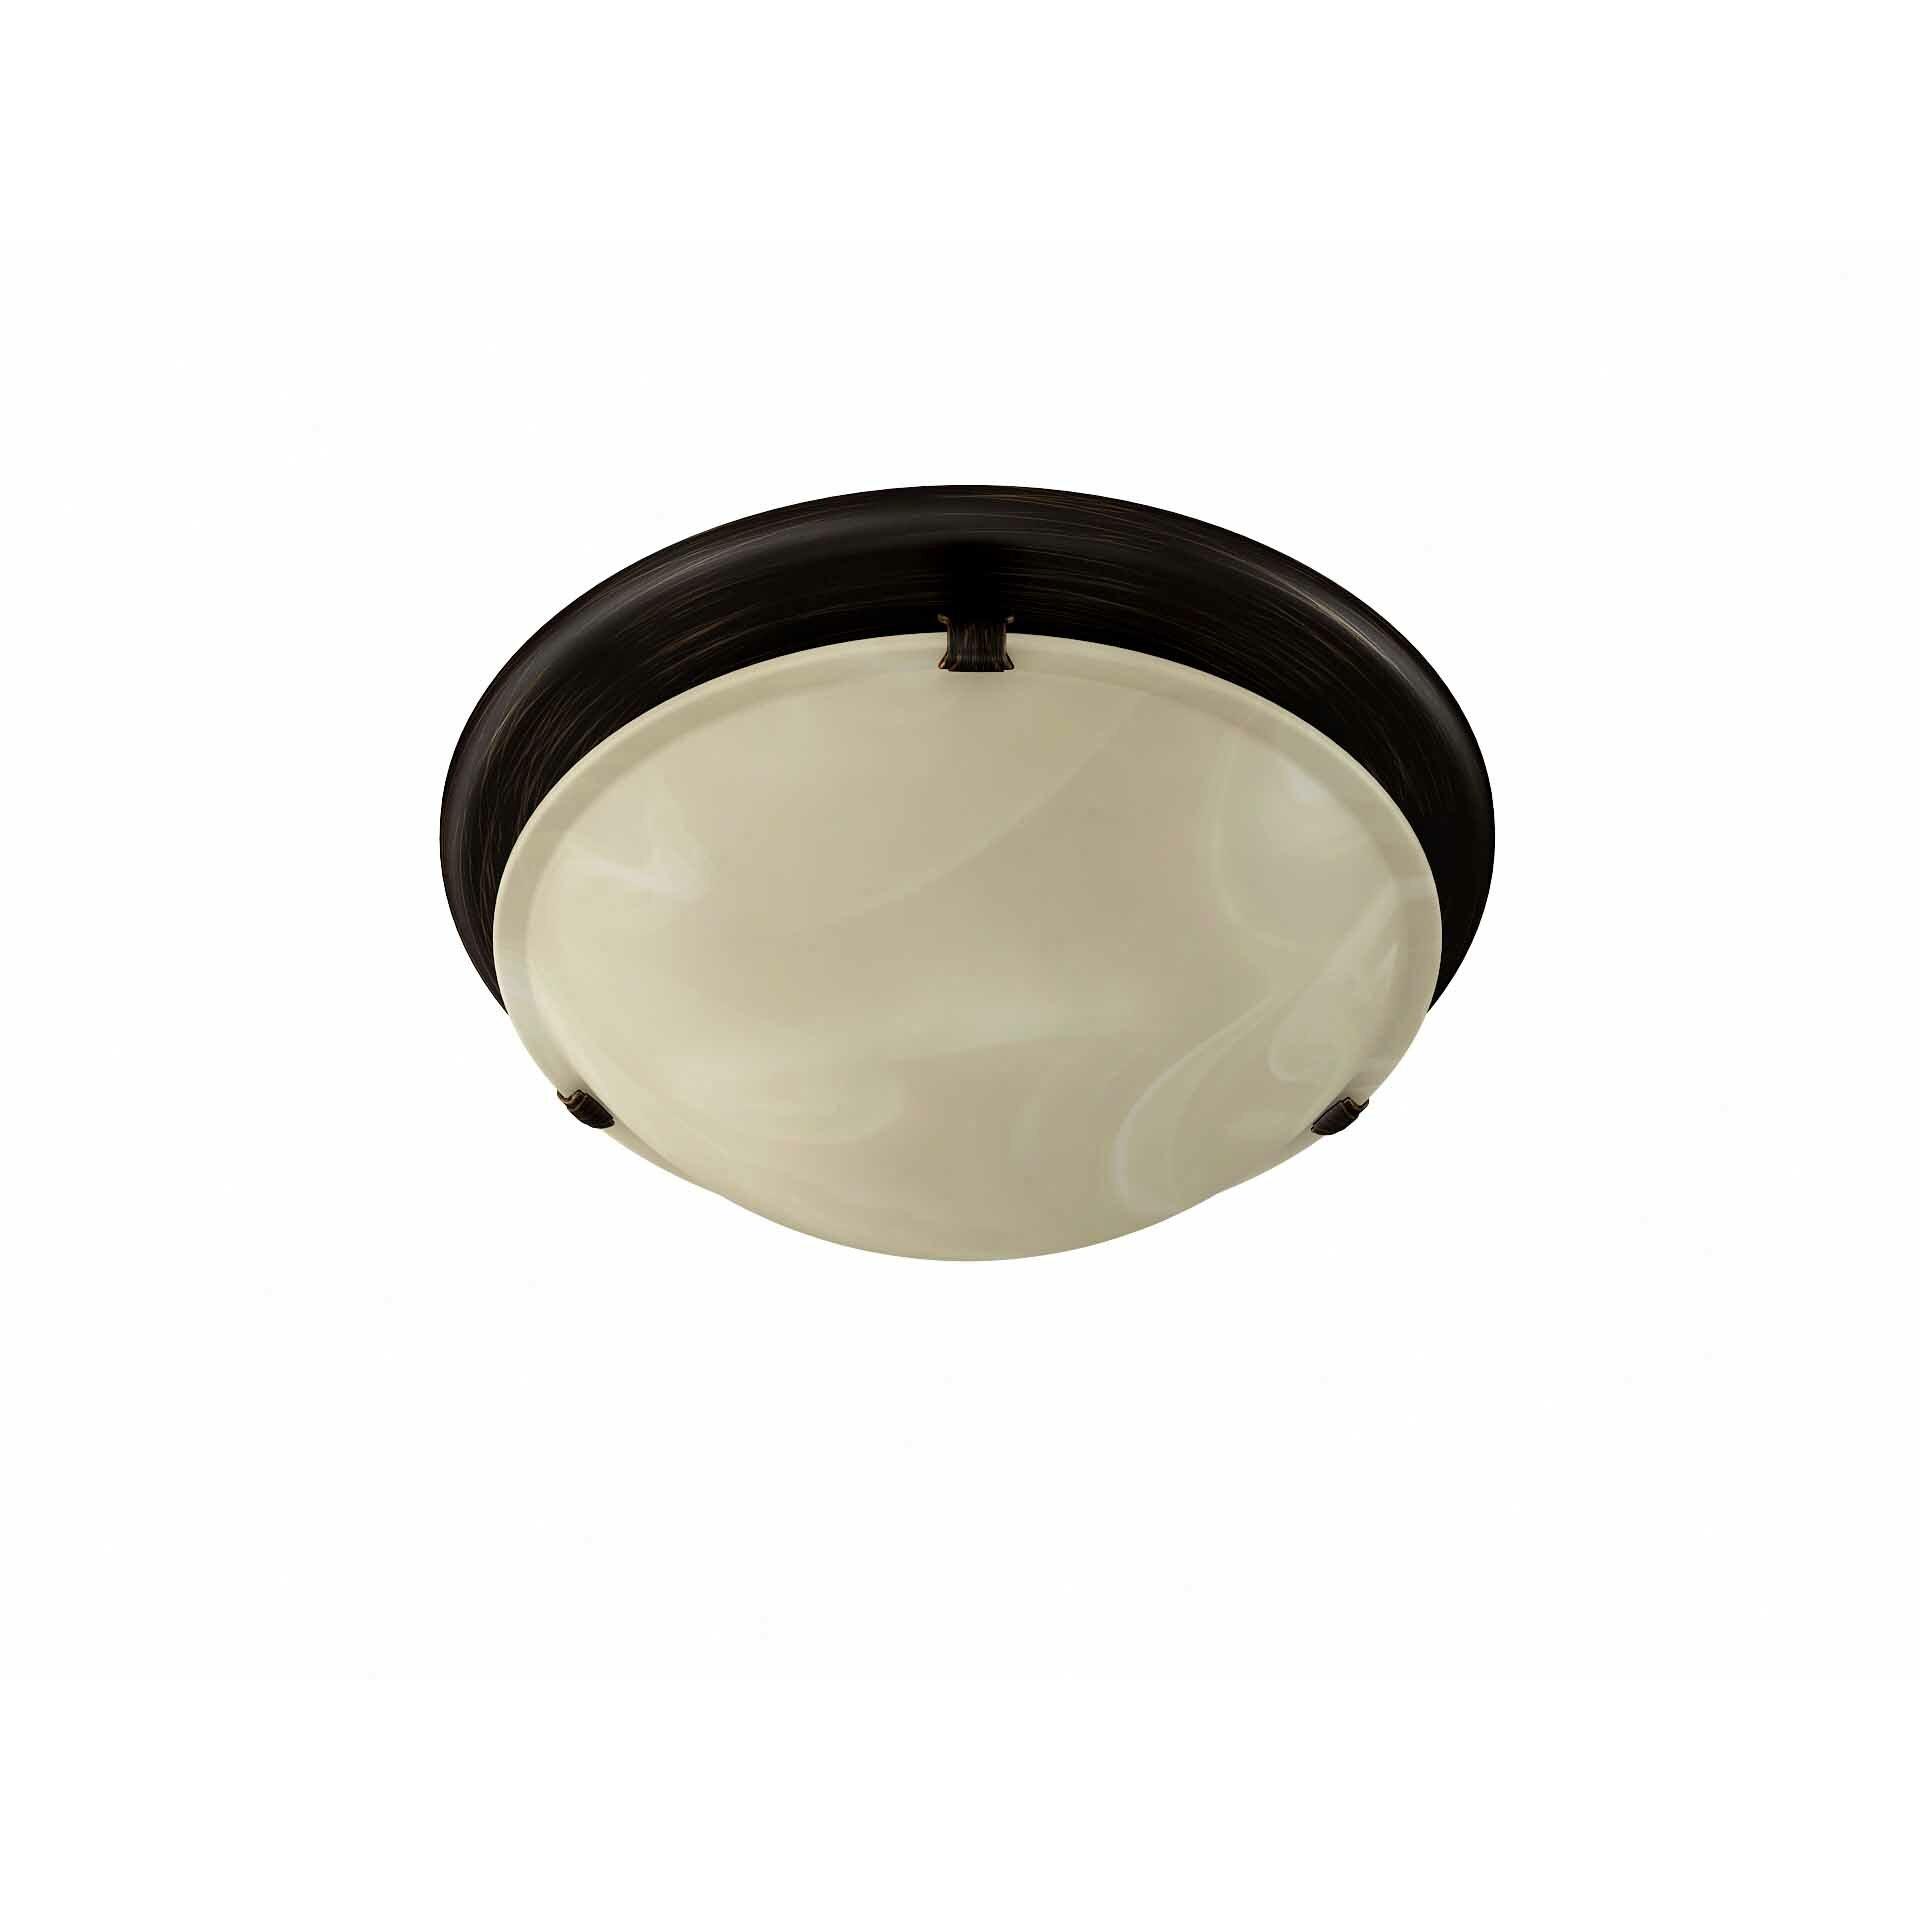 Broan 80 Cfm Bathroom Fan With Light Reviews Wayfair